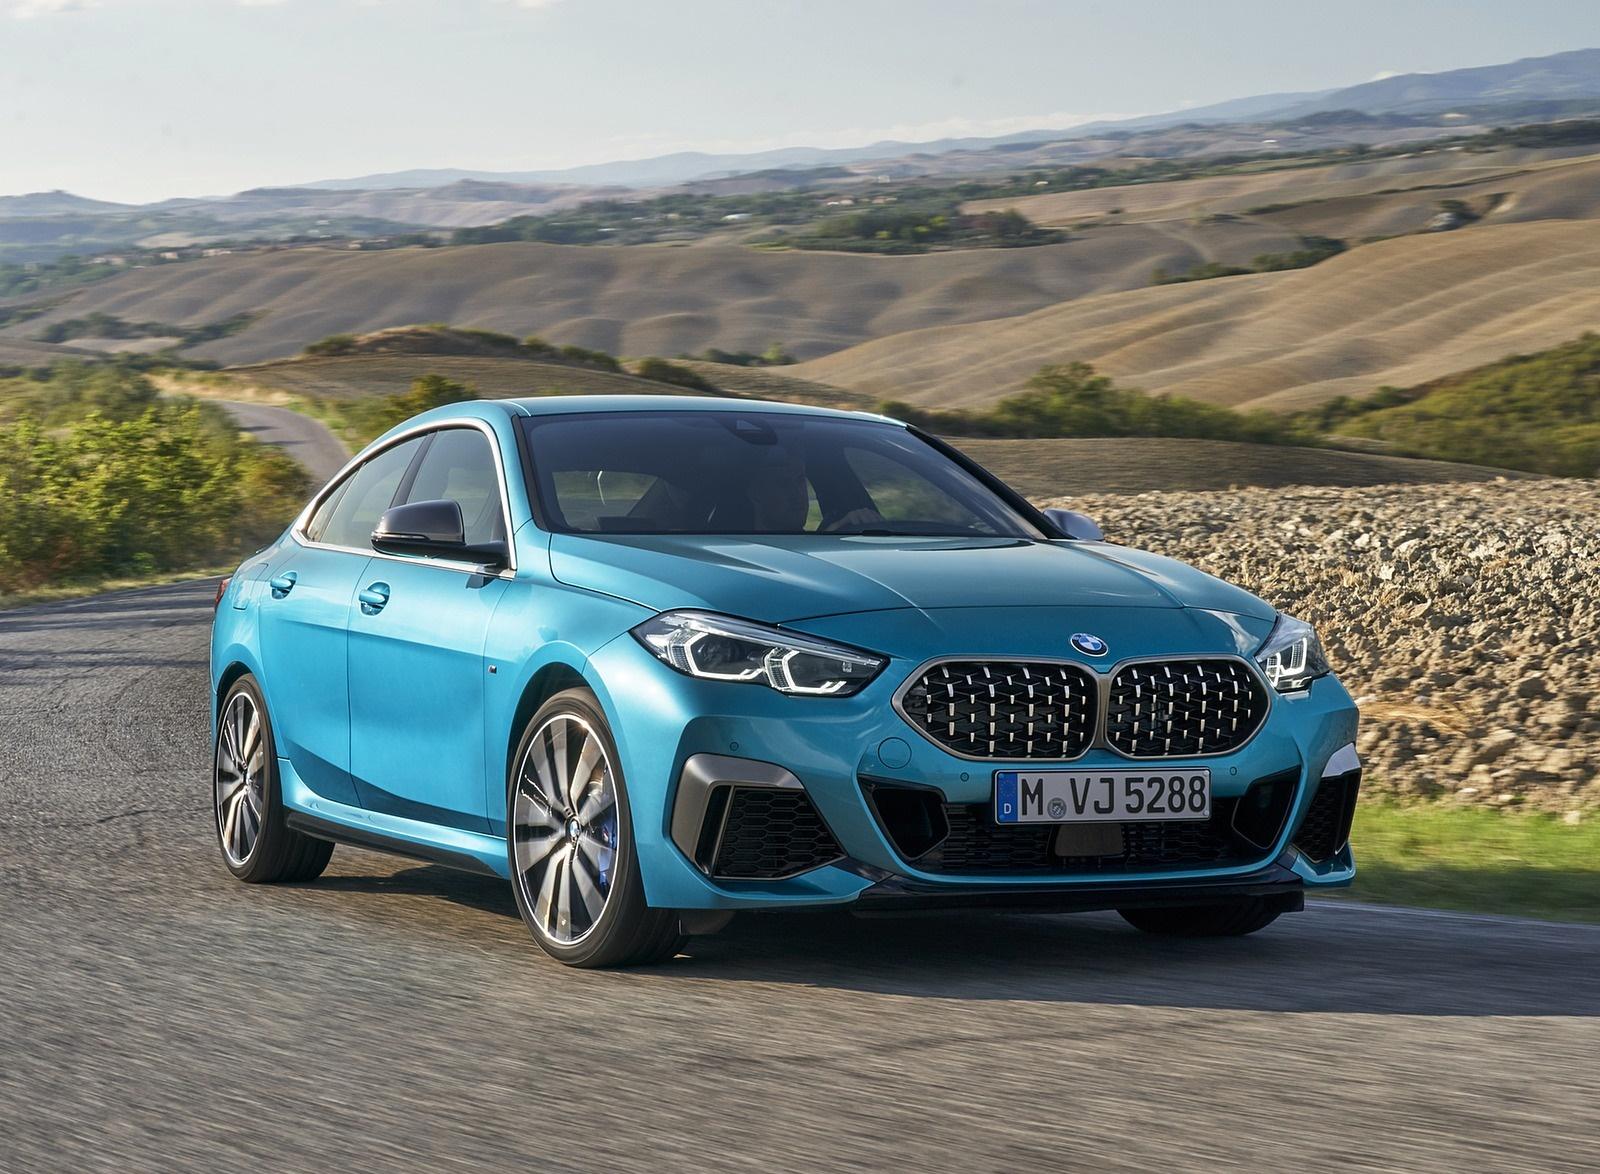 2020 BMW M235i Gran Coupe xDrive (Color: Snapper Rocks Blue Metallic) Front Three-Quarter Wallpapers (13)